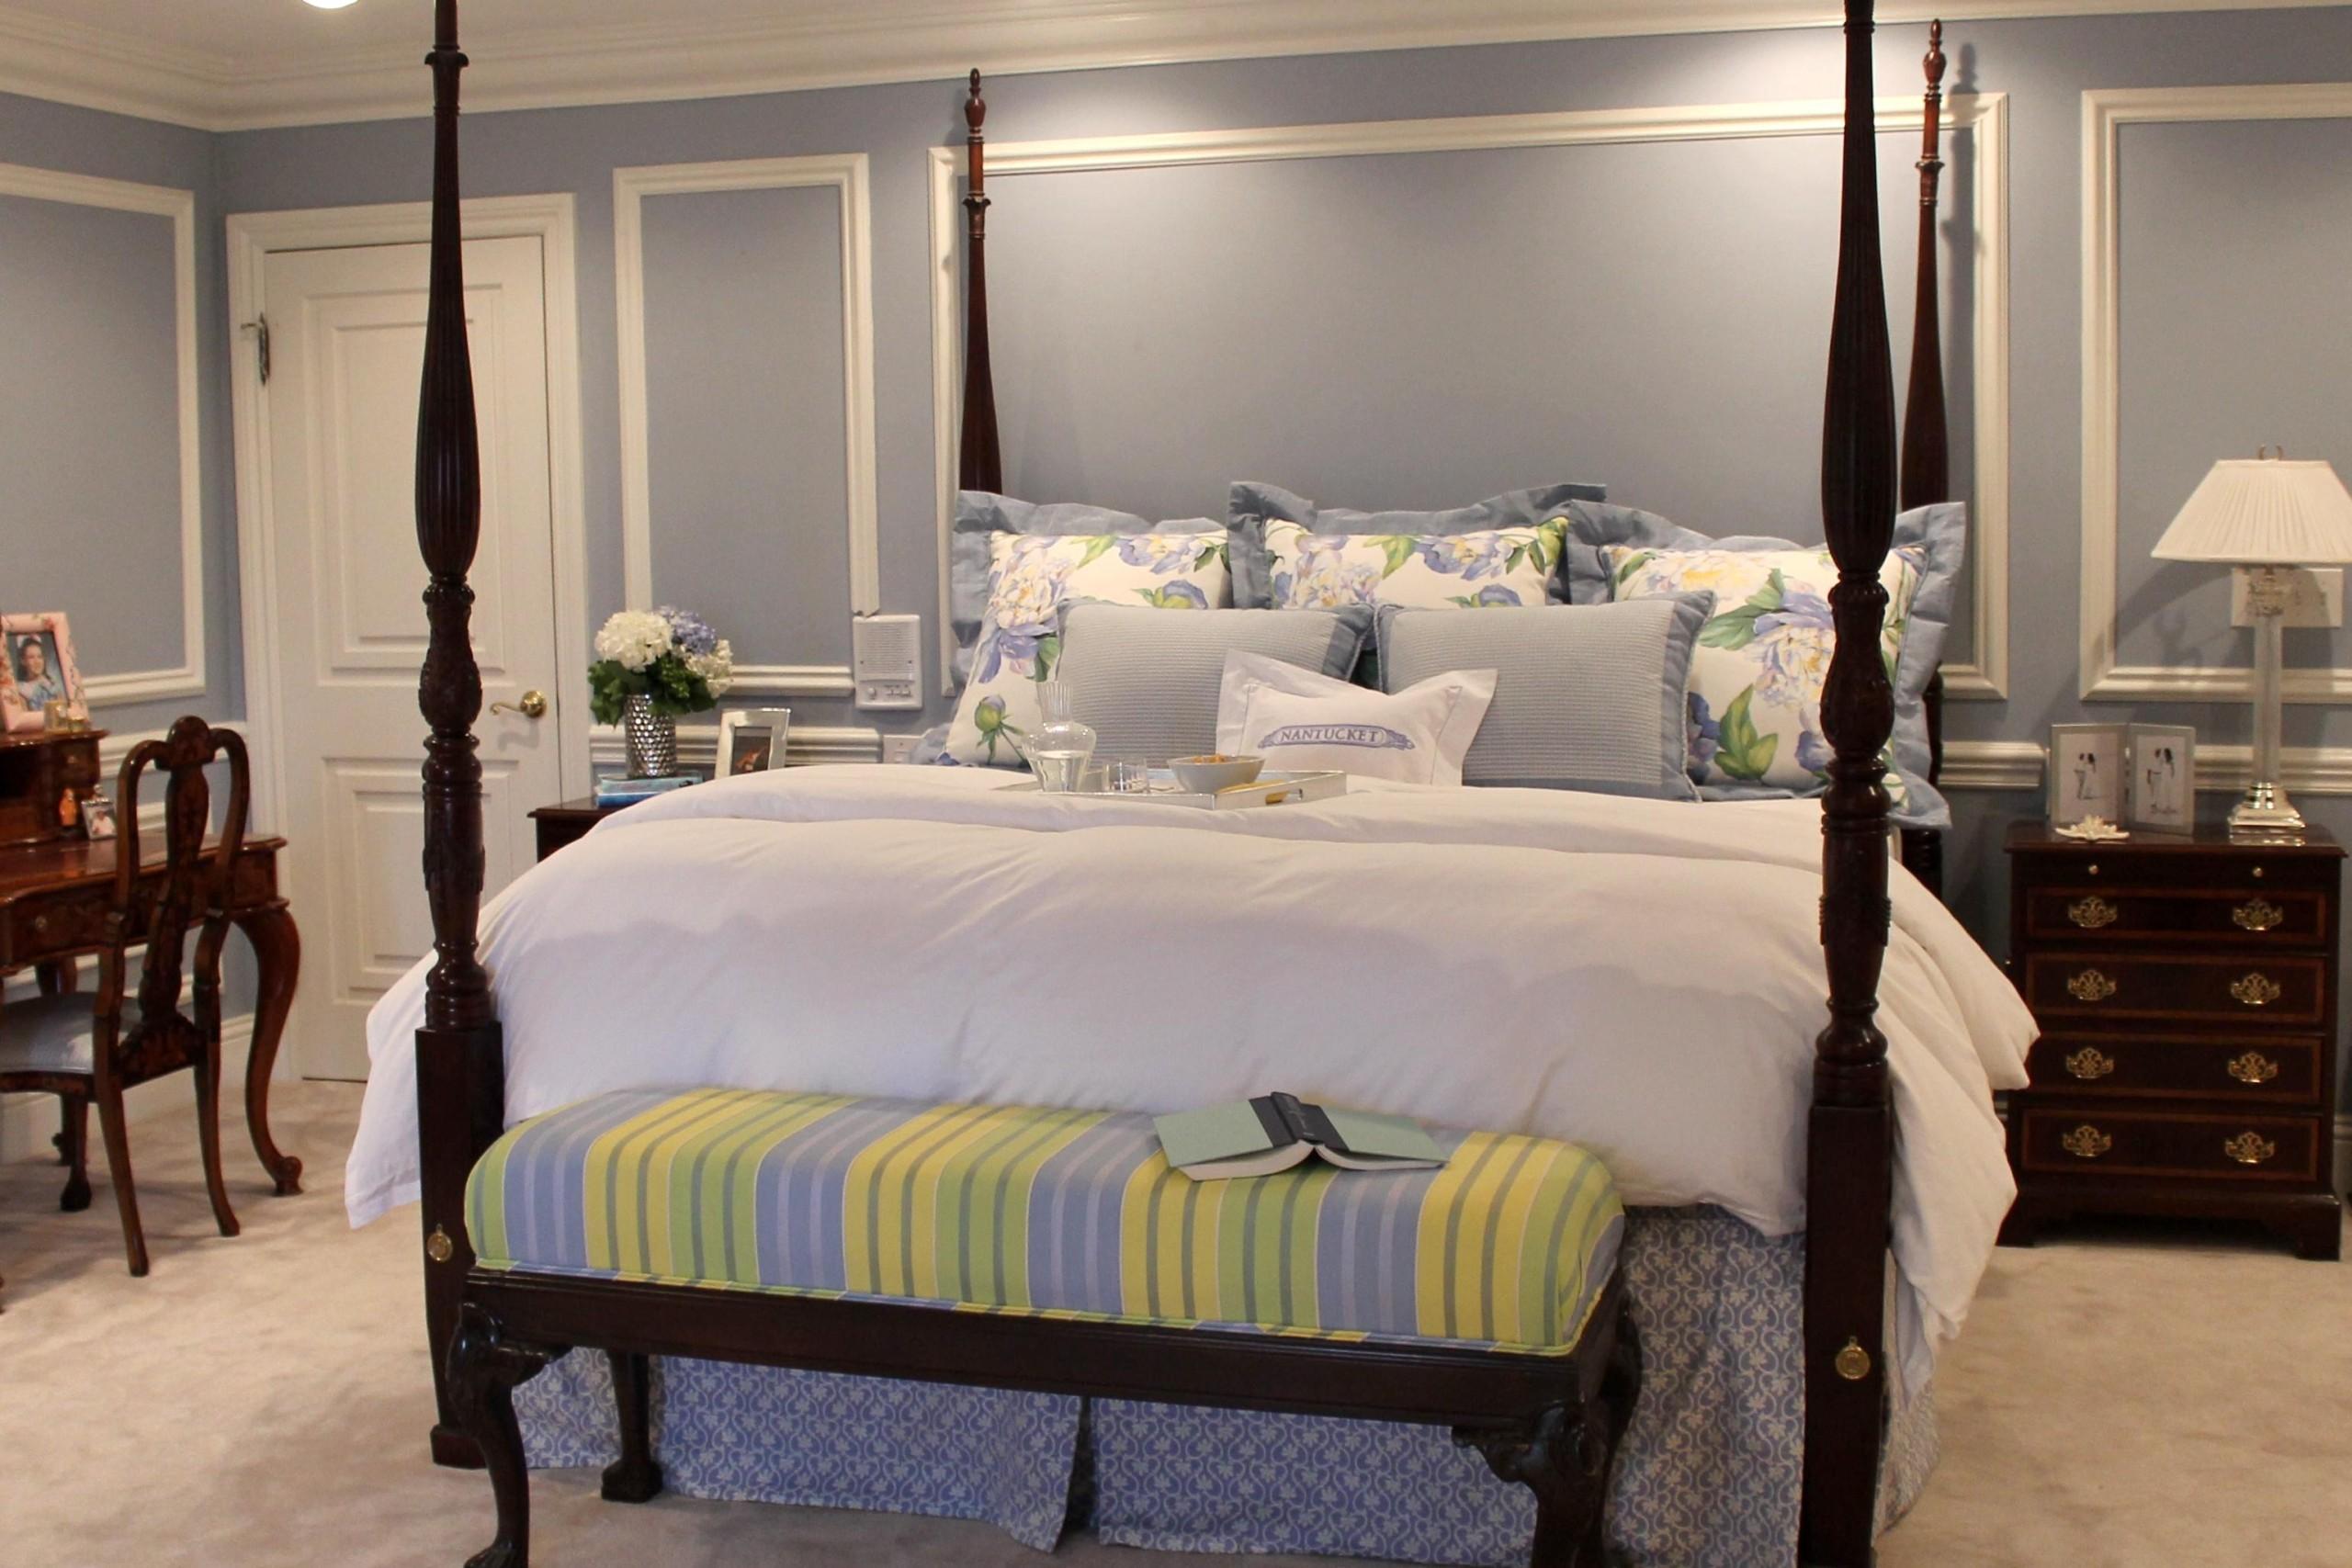 traditional romantic bedroom ideas photo - 4